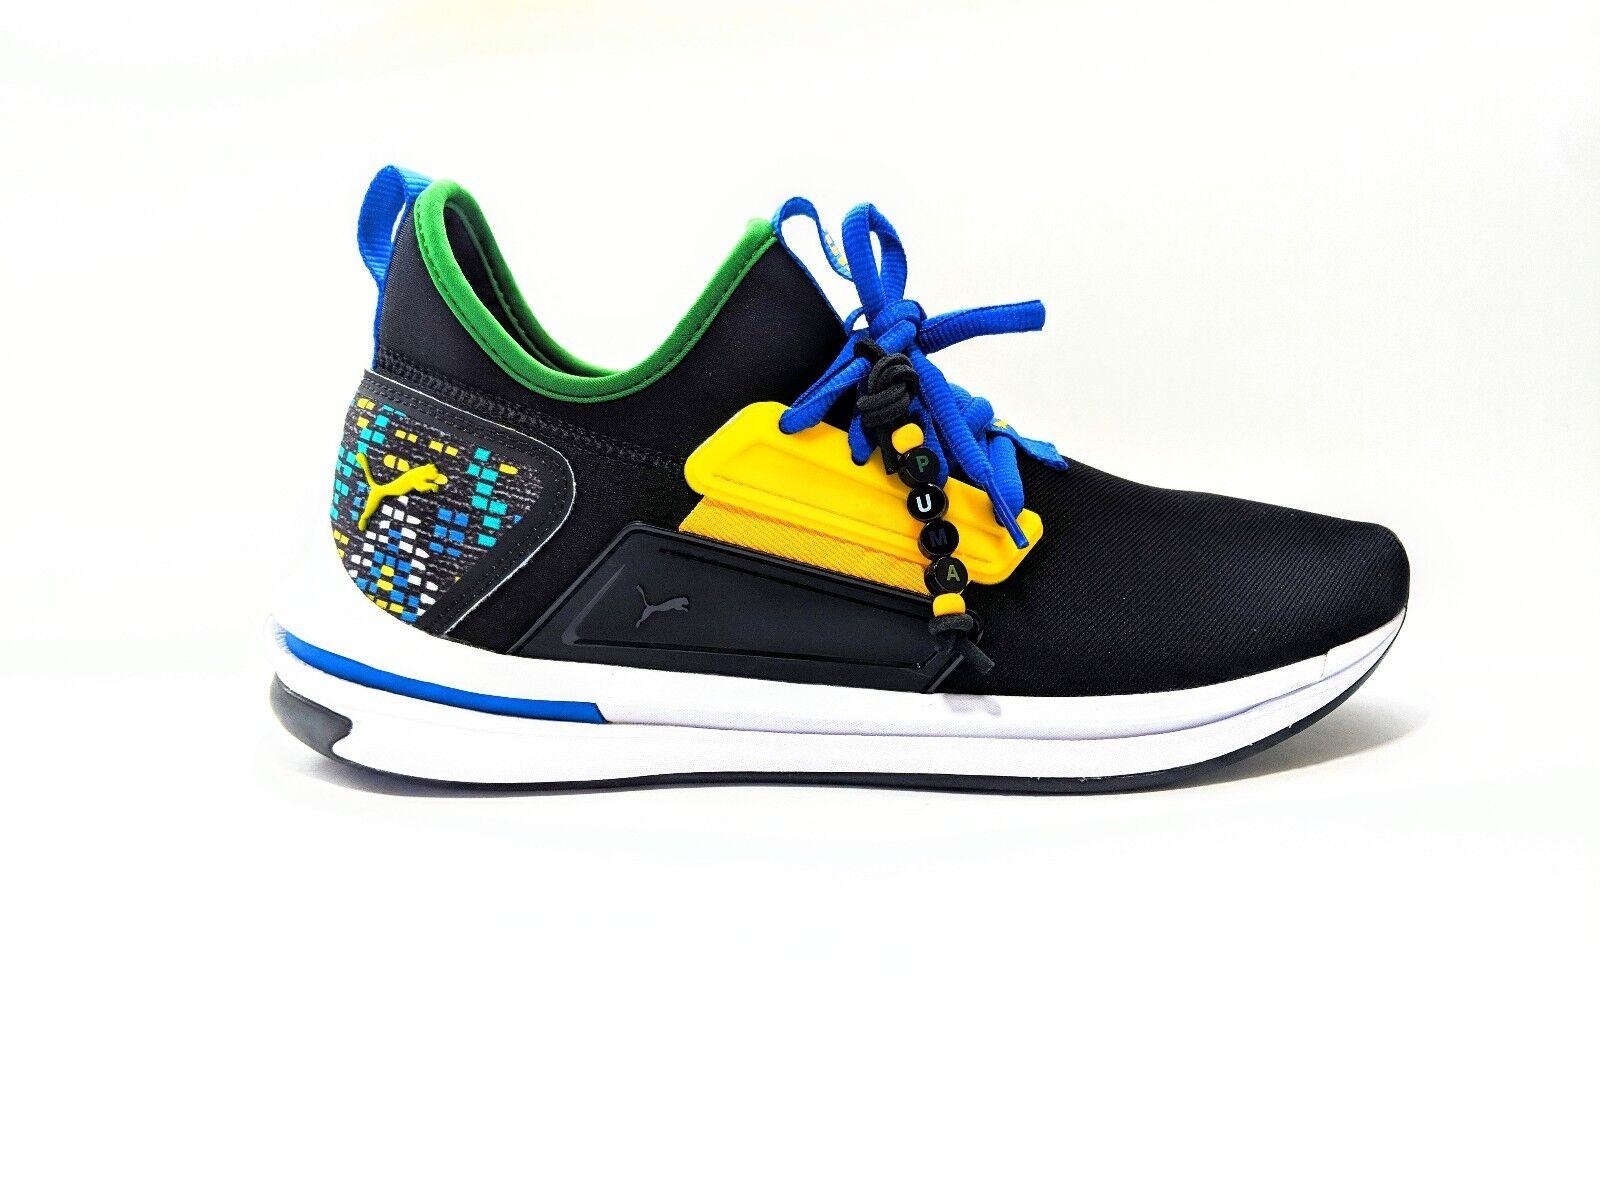 58d5903a50 New balance u520bb d triple nero suede Uomo running shoes scarpe da  ginnastica shoes,